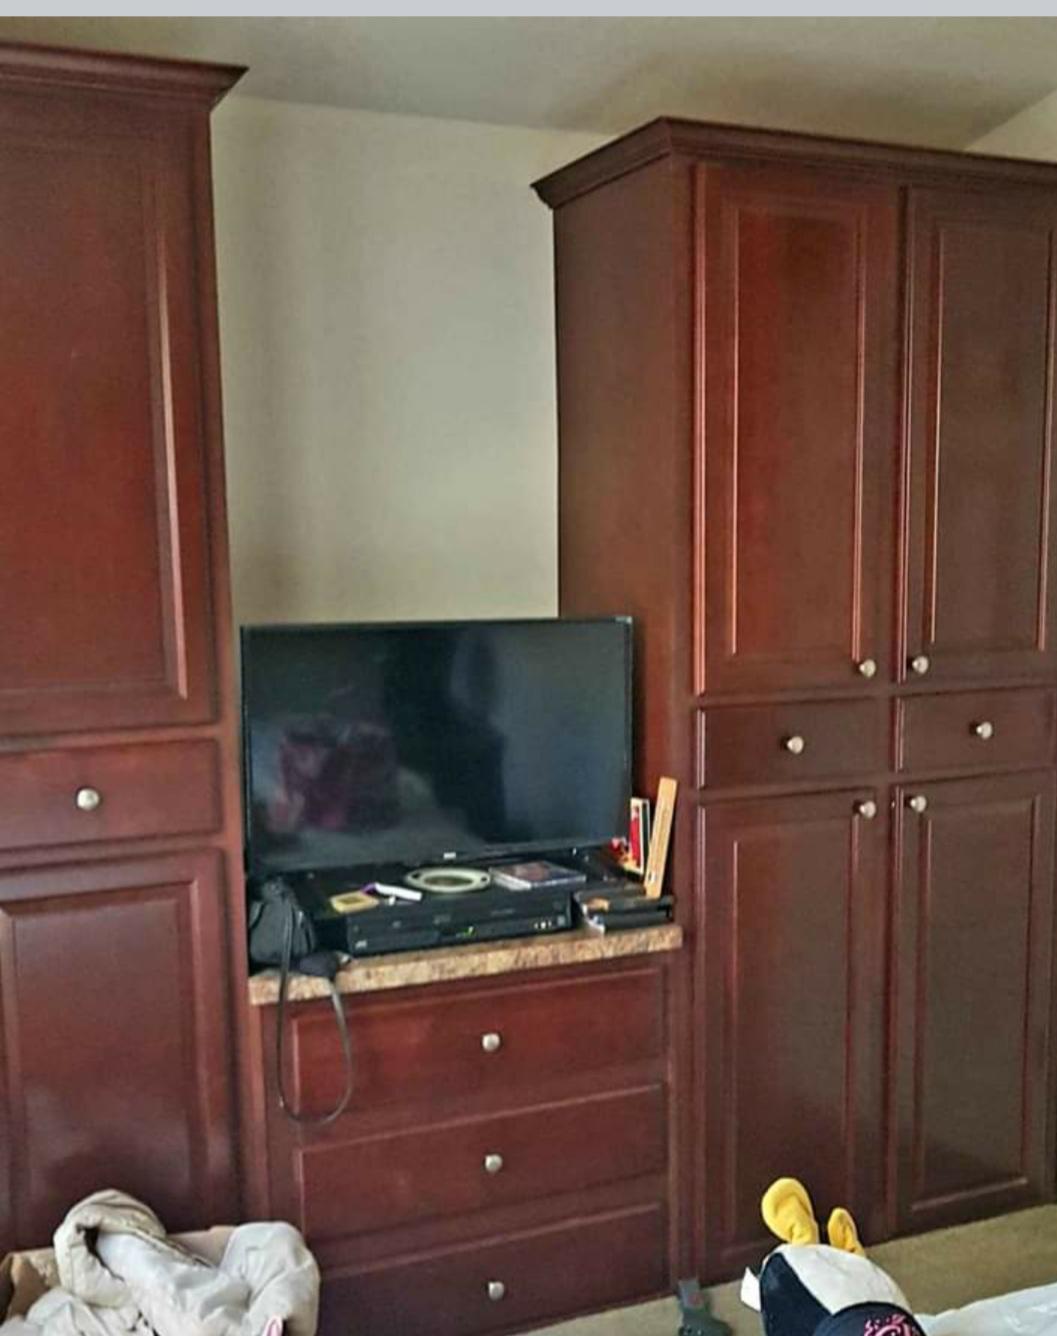 https://0901.nccdn.net/4_2/000/000/08b/5dc/bedroom-cabinets.jpg